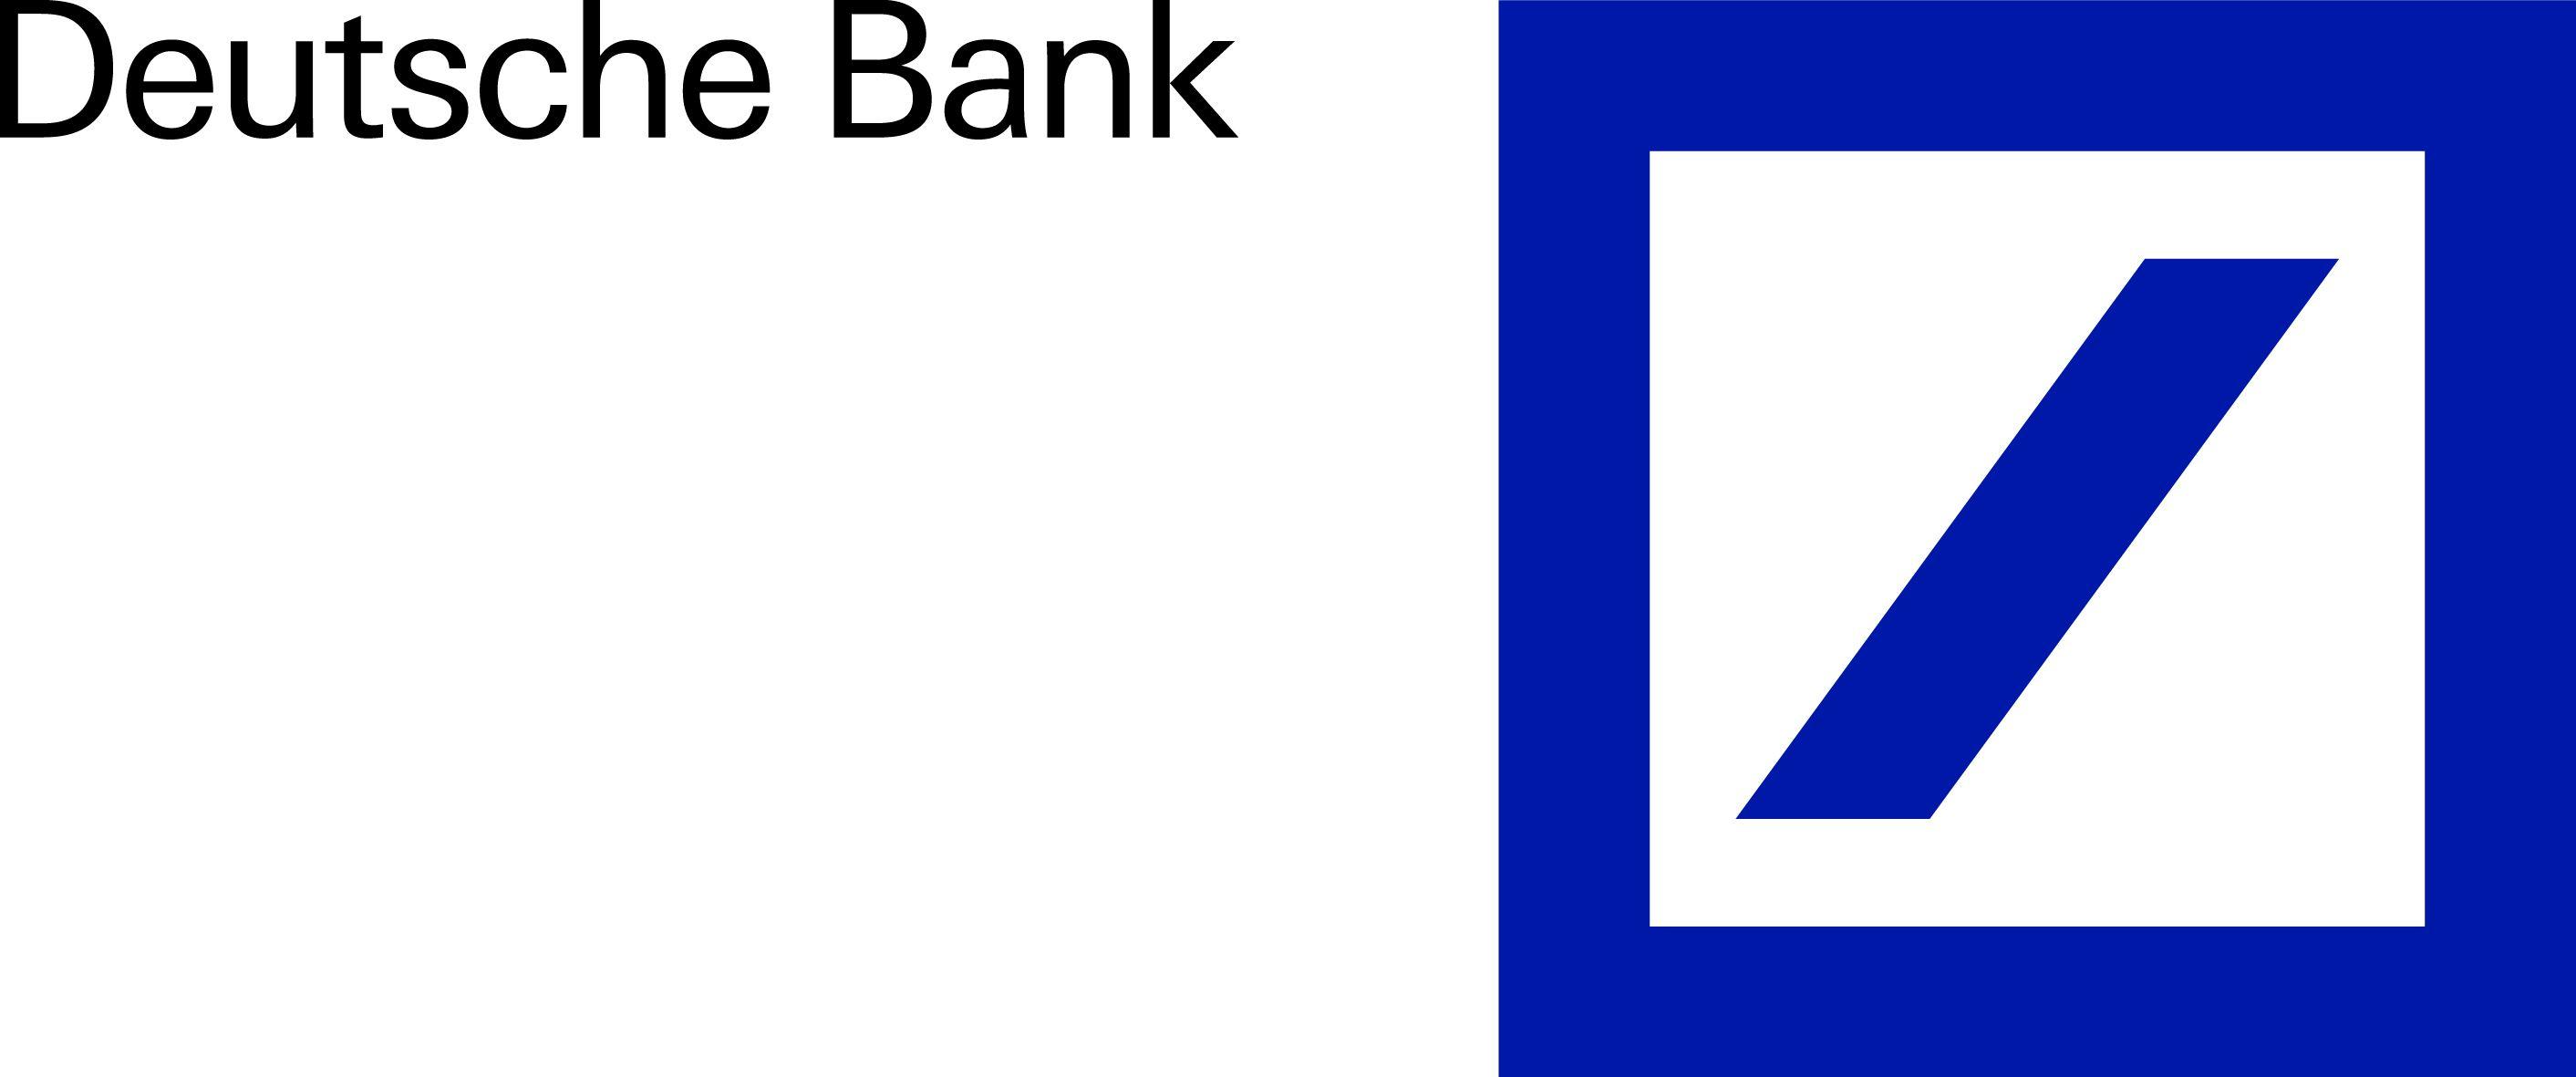 deutsche_bank logo Banks logo, Lettering, Logos